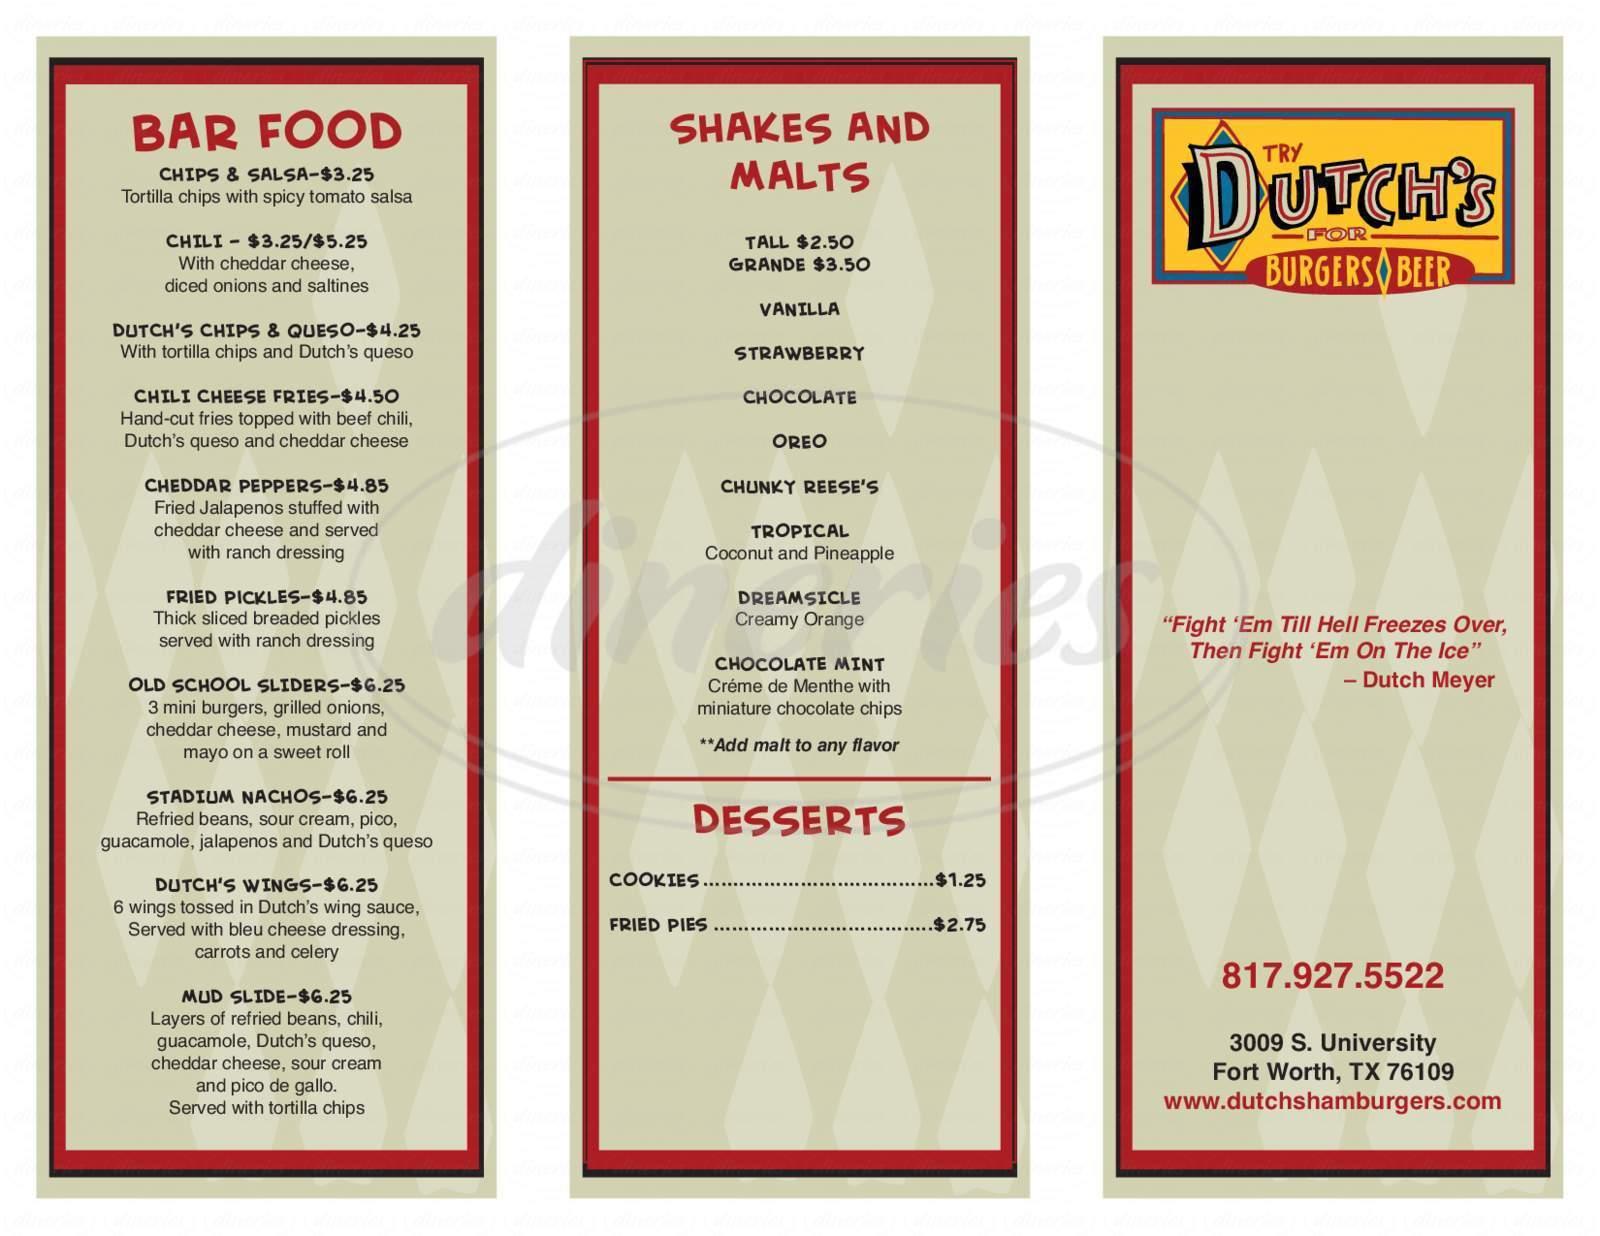 menu for Dutch's Hamburgers